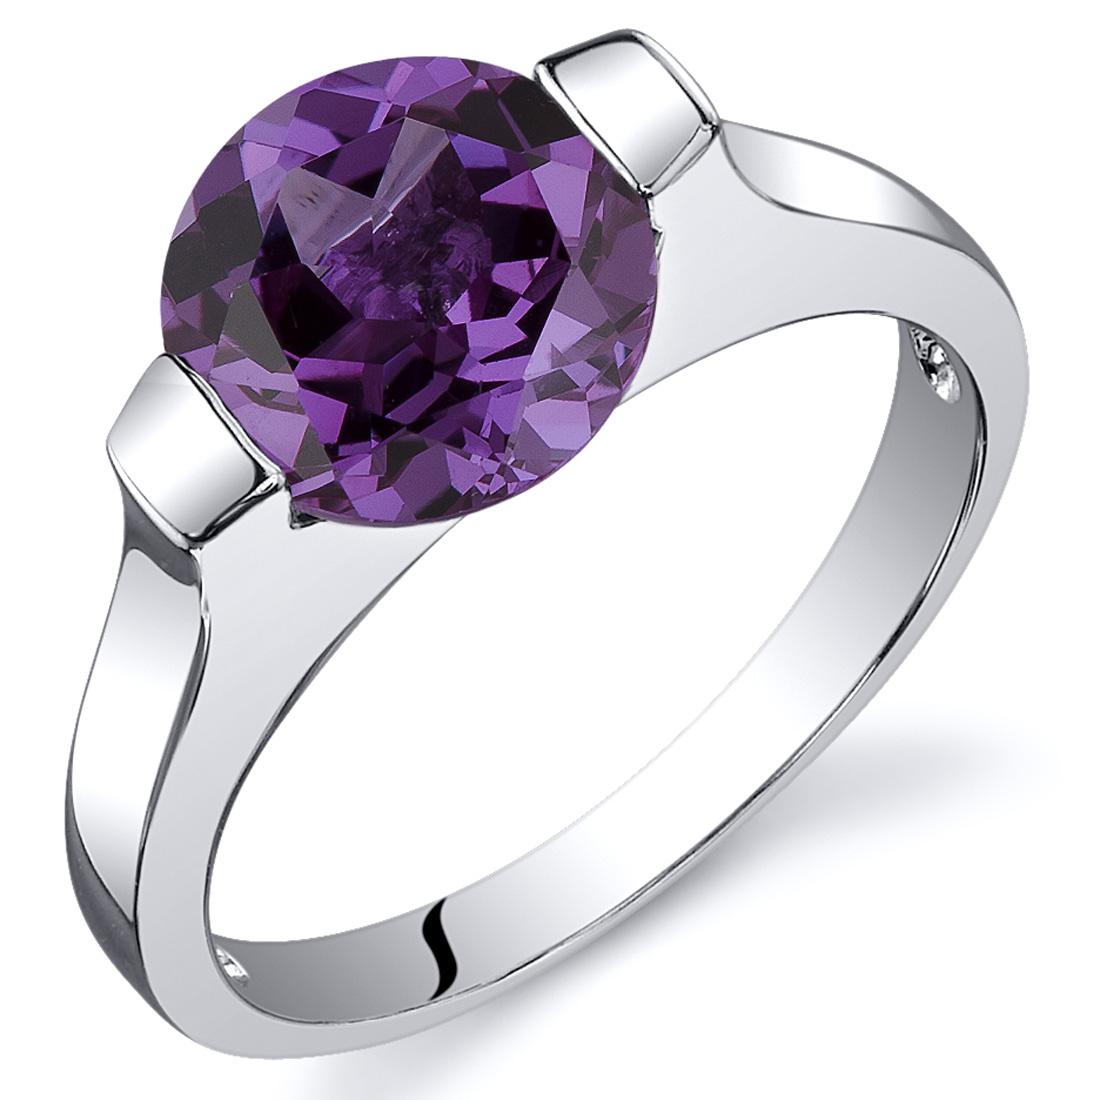 Bezel Set 2.75 cts Alexandrite Engagement Ring Sterling ...